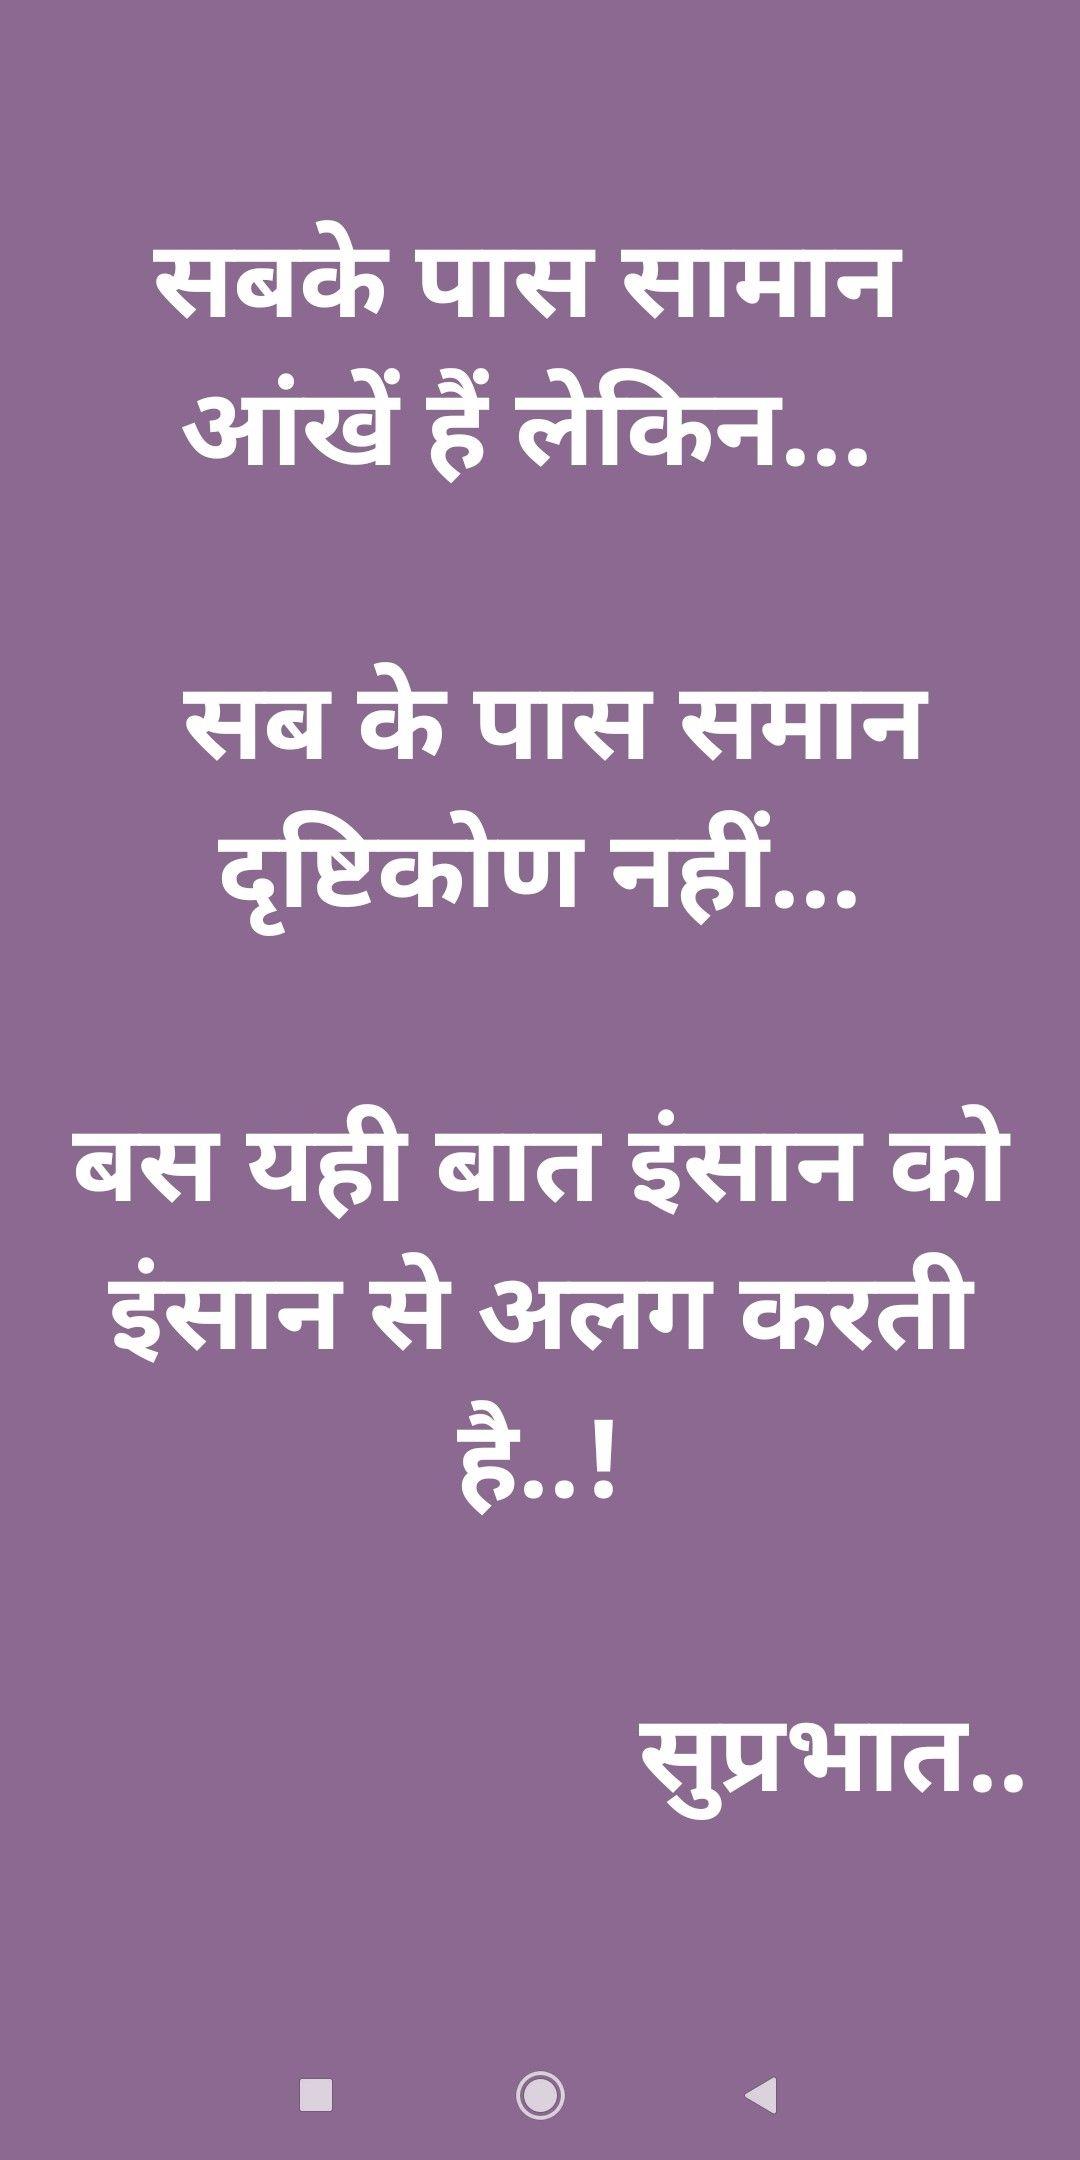 Good Morning In 2020 Hindi Good Morning Quotes Good Morning Quotes Some Inspirational Quotes